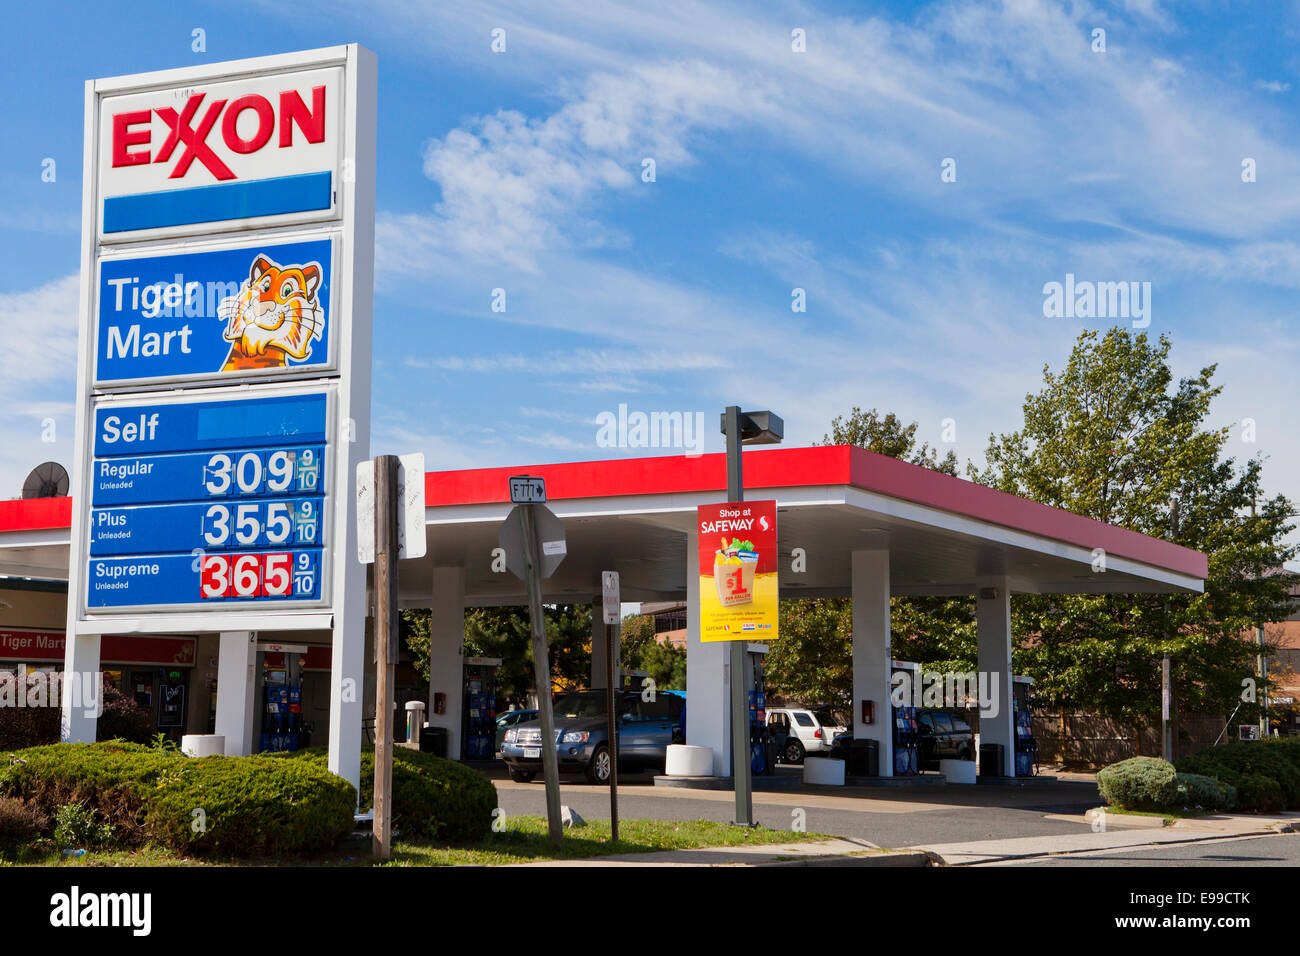 Exxon Gas Station Usa Stock Photo 74581043 Alamy